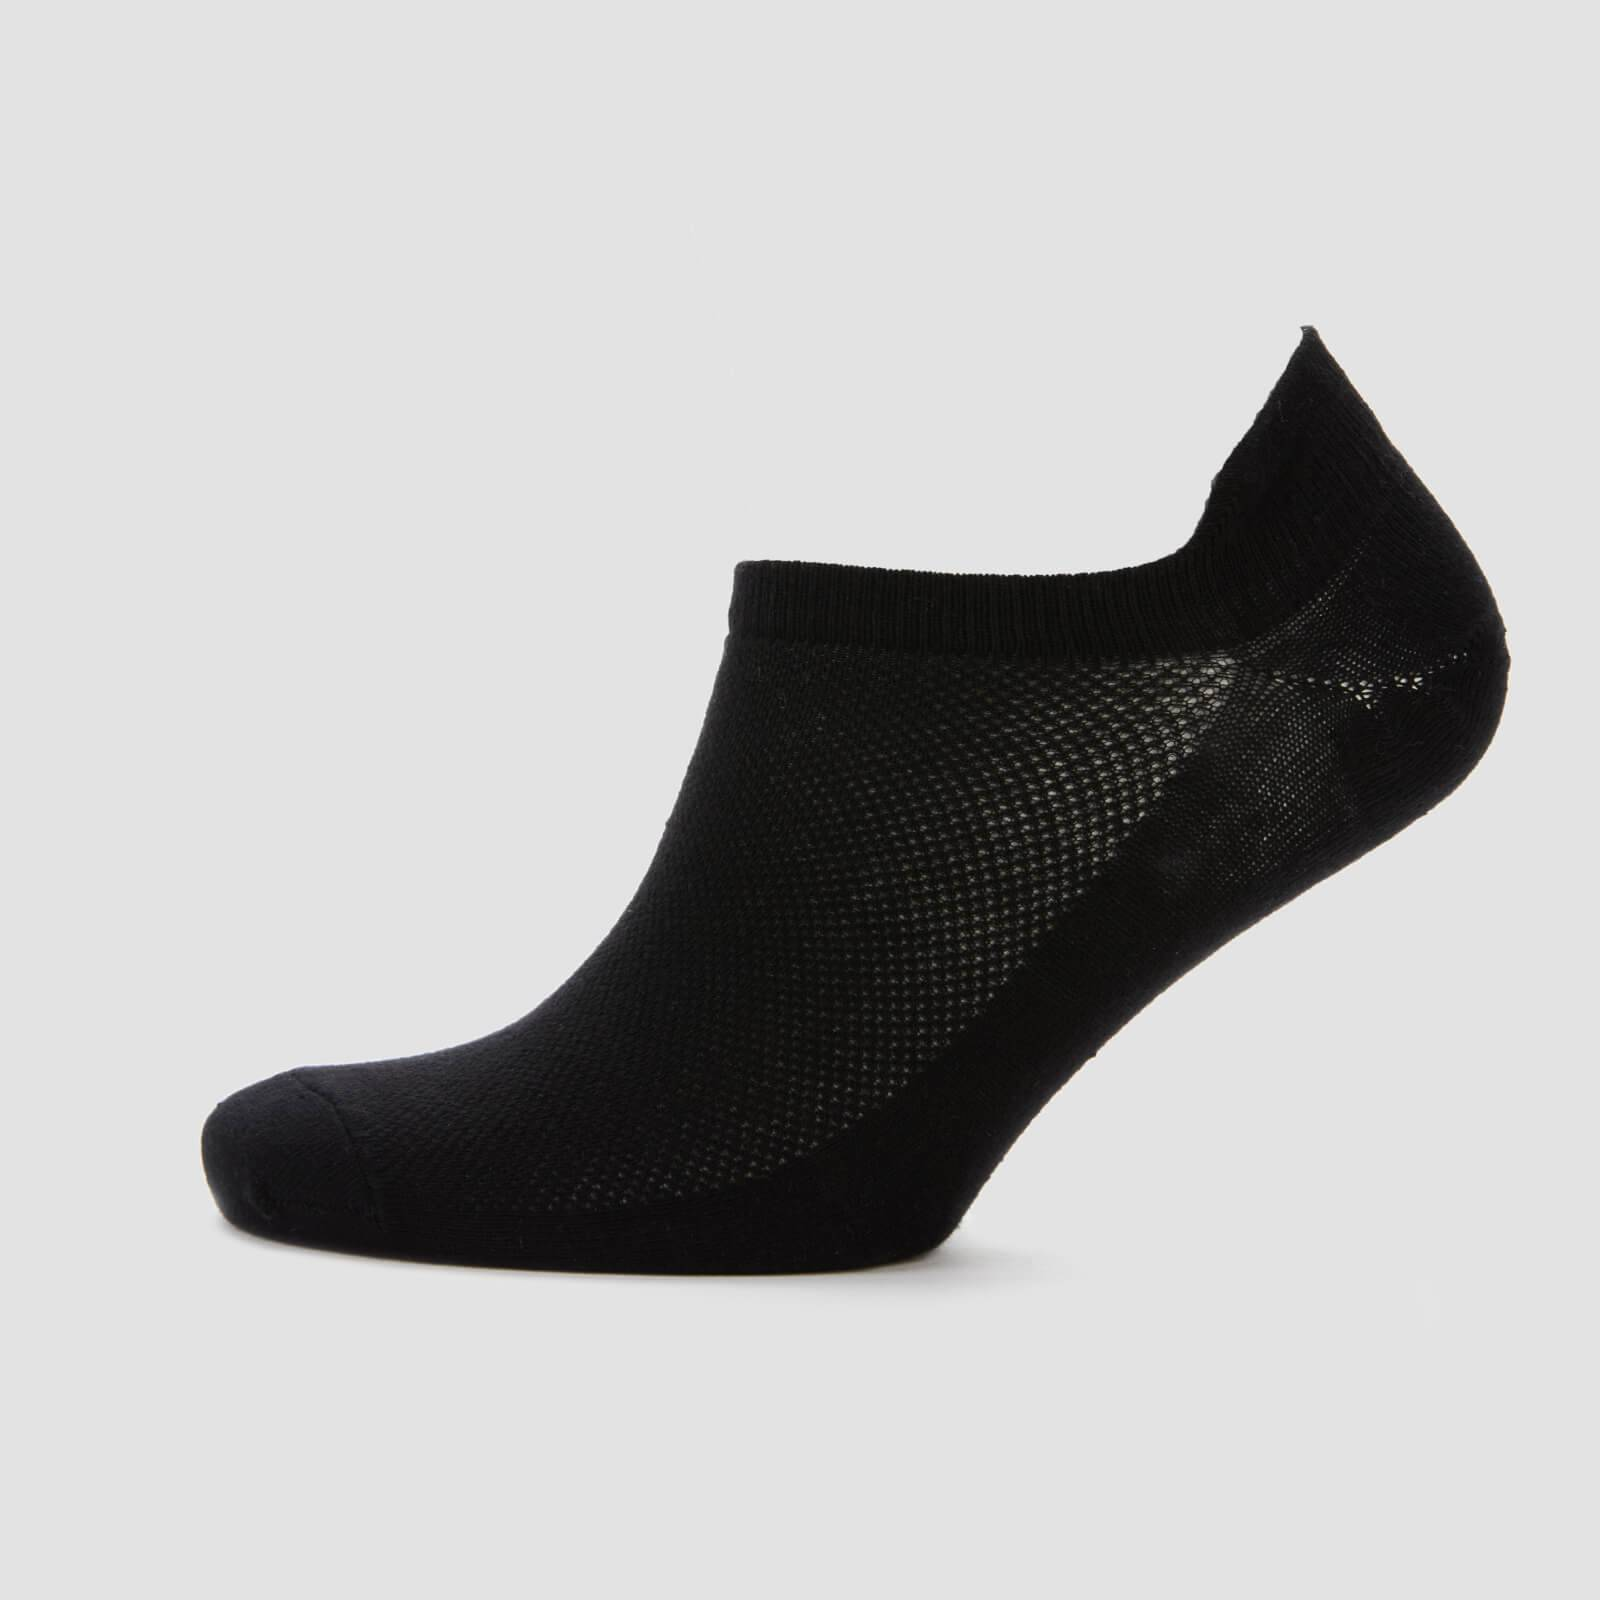 Myprotein MP Essentials Men's Ankle Socks - Black (3 Pack) - UK 6-8